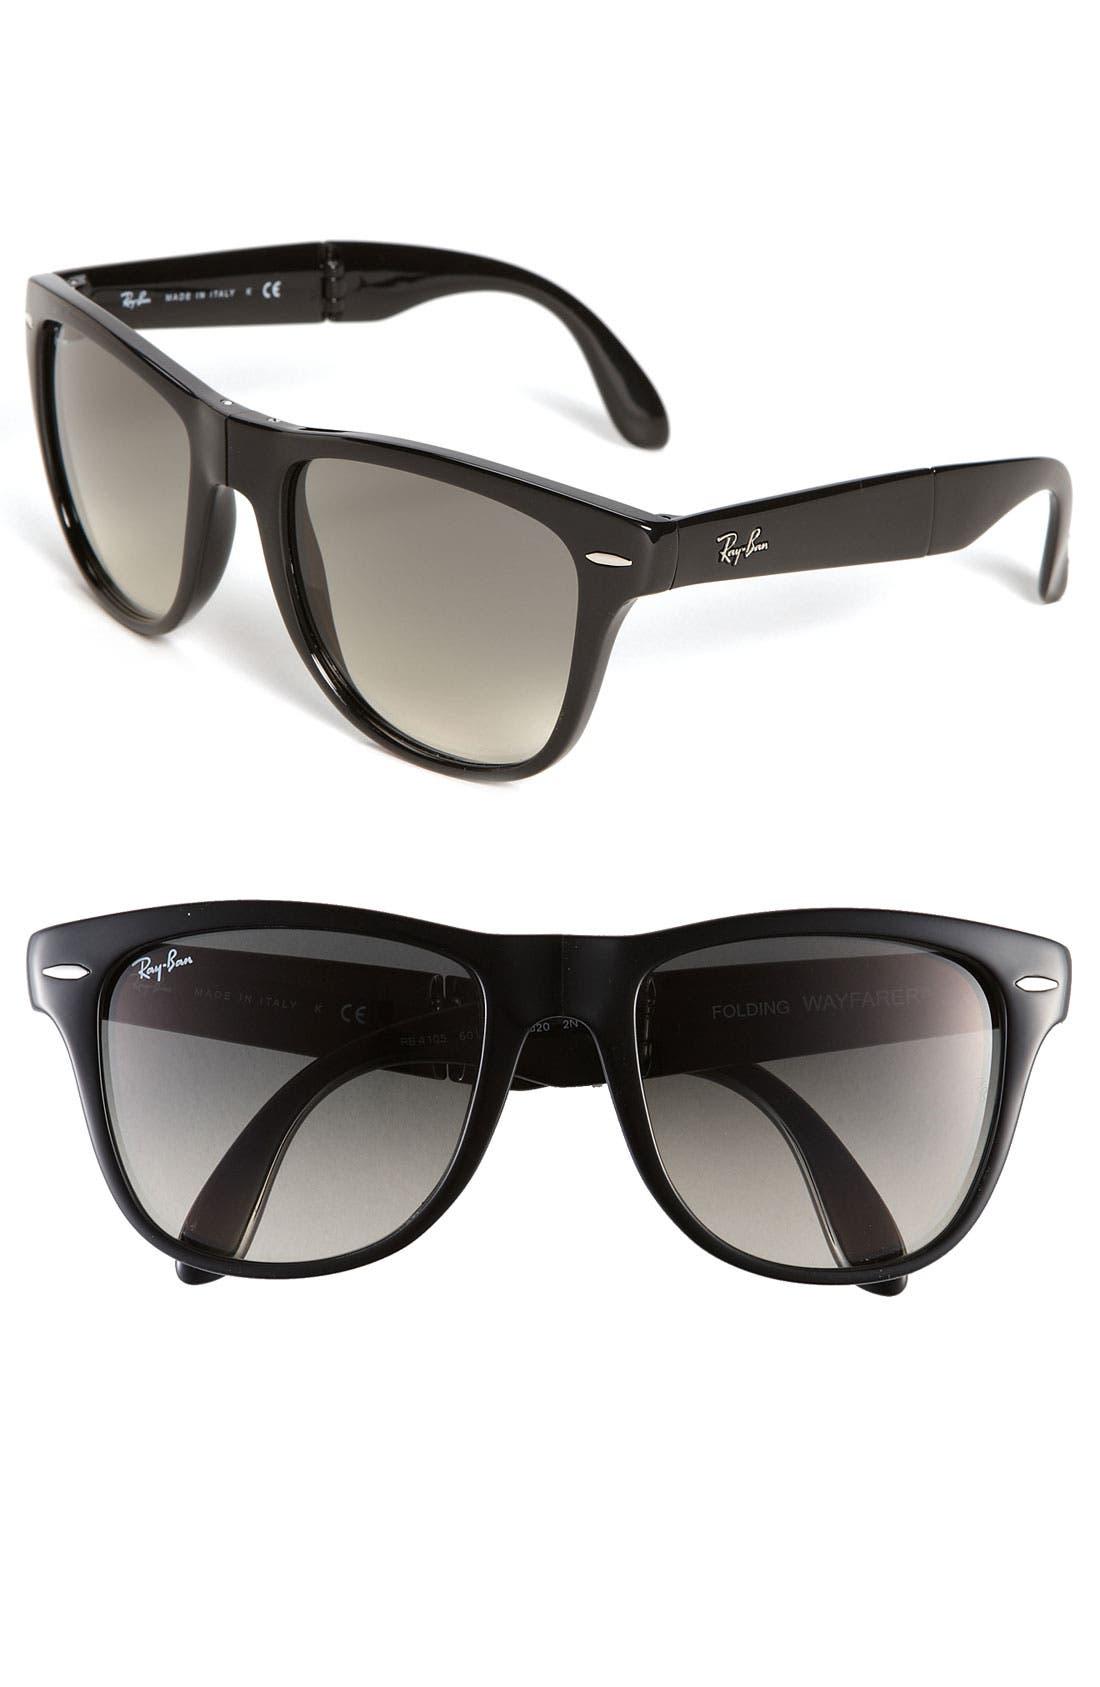 Main Image - Ray-Ban 'Folding Wayfarer' 54mm Sunglasses